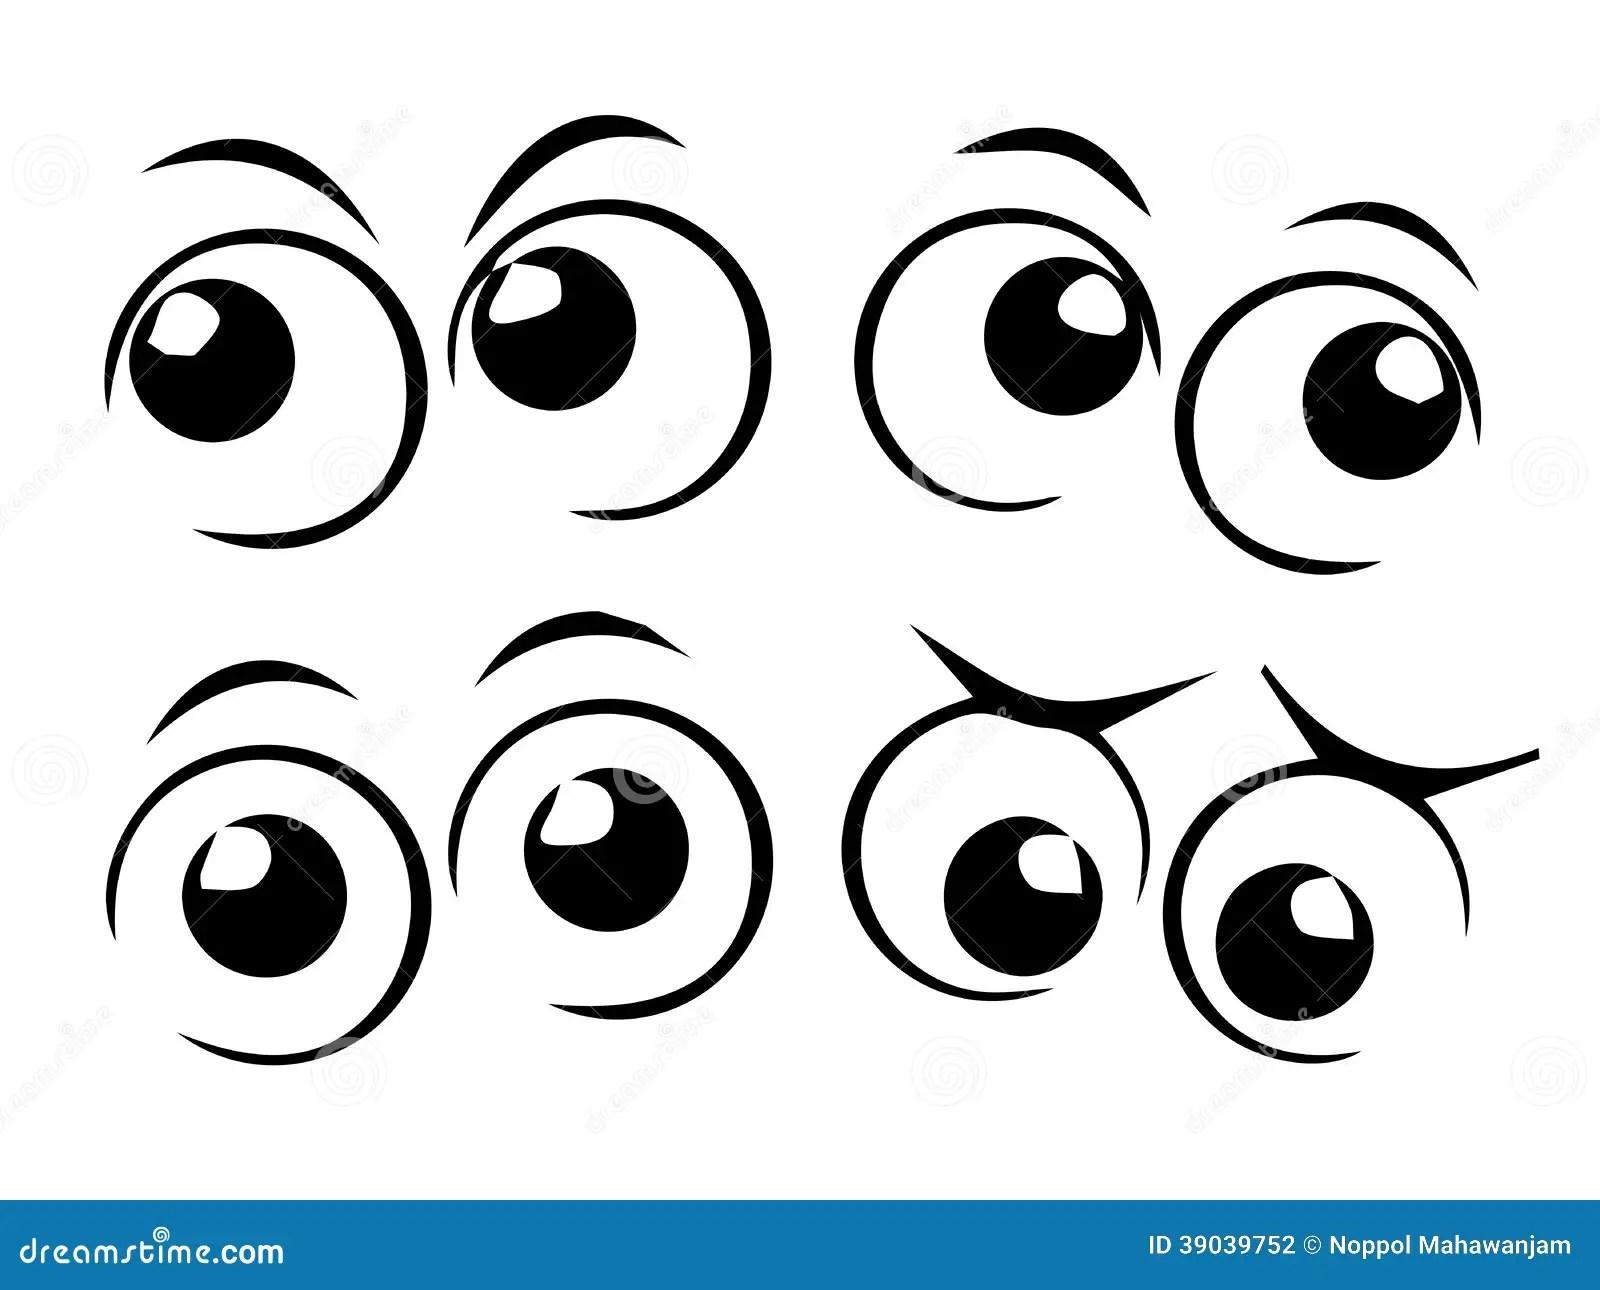 Cartoon Eyes Stock Vector Illustration Of Gaze Stare